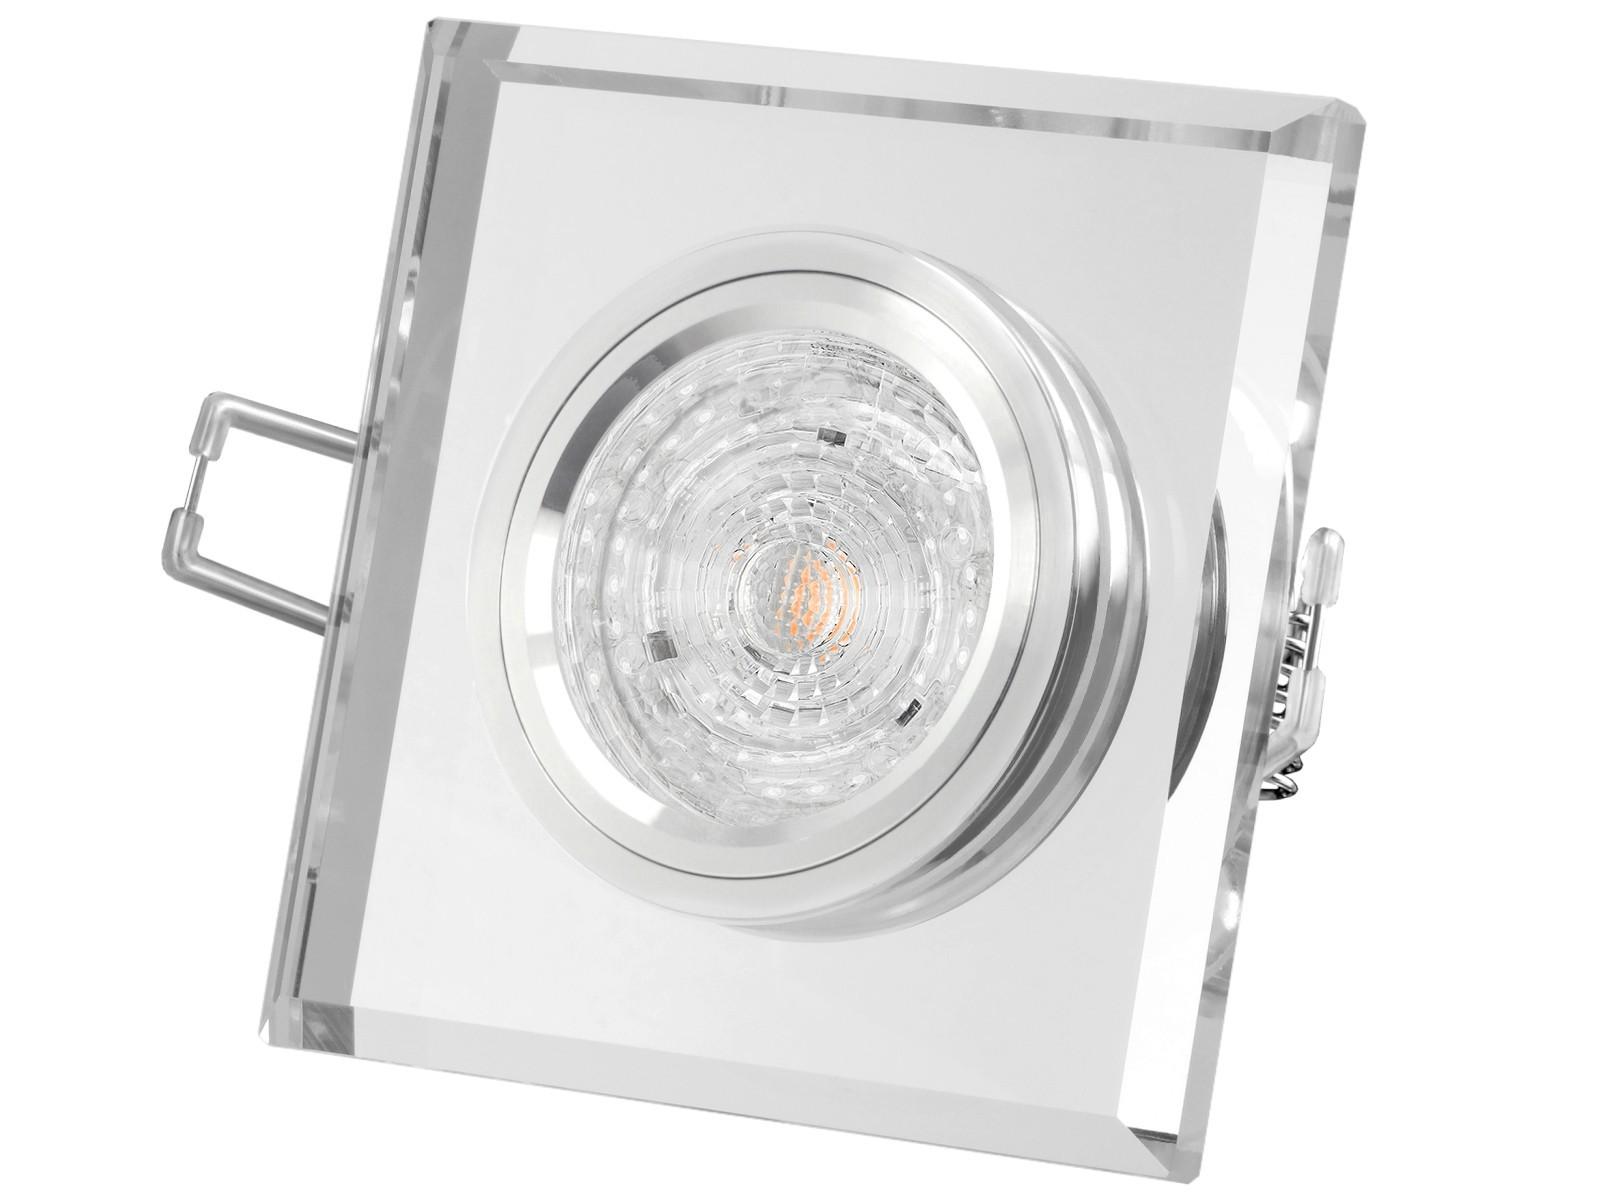 Shop-1600x1200 Fabelhafte Feuchtraum Led Einbaustrahler 230v Dekorationen